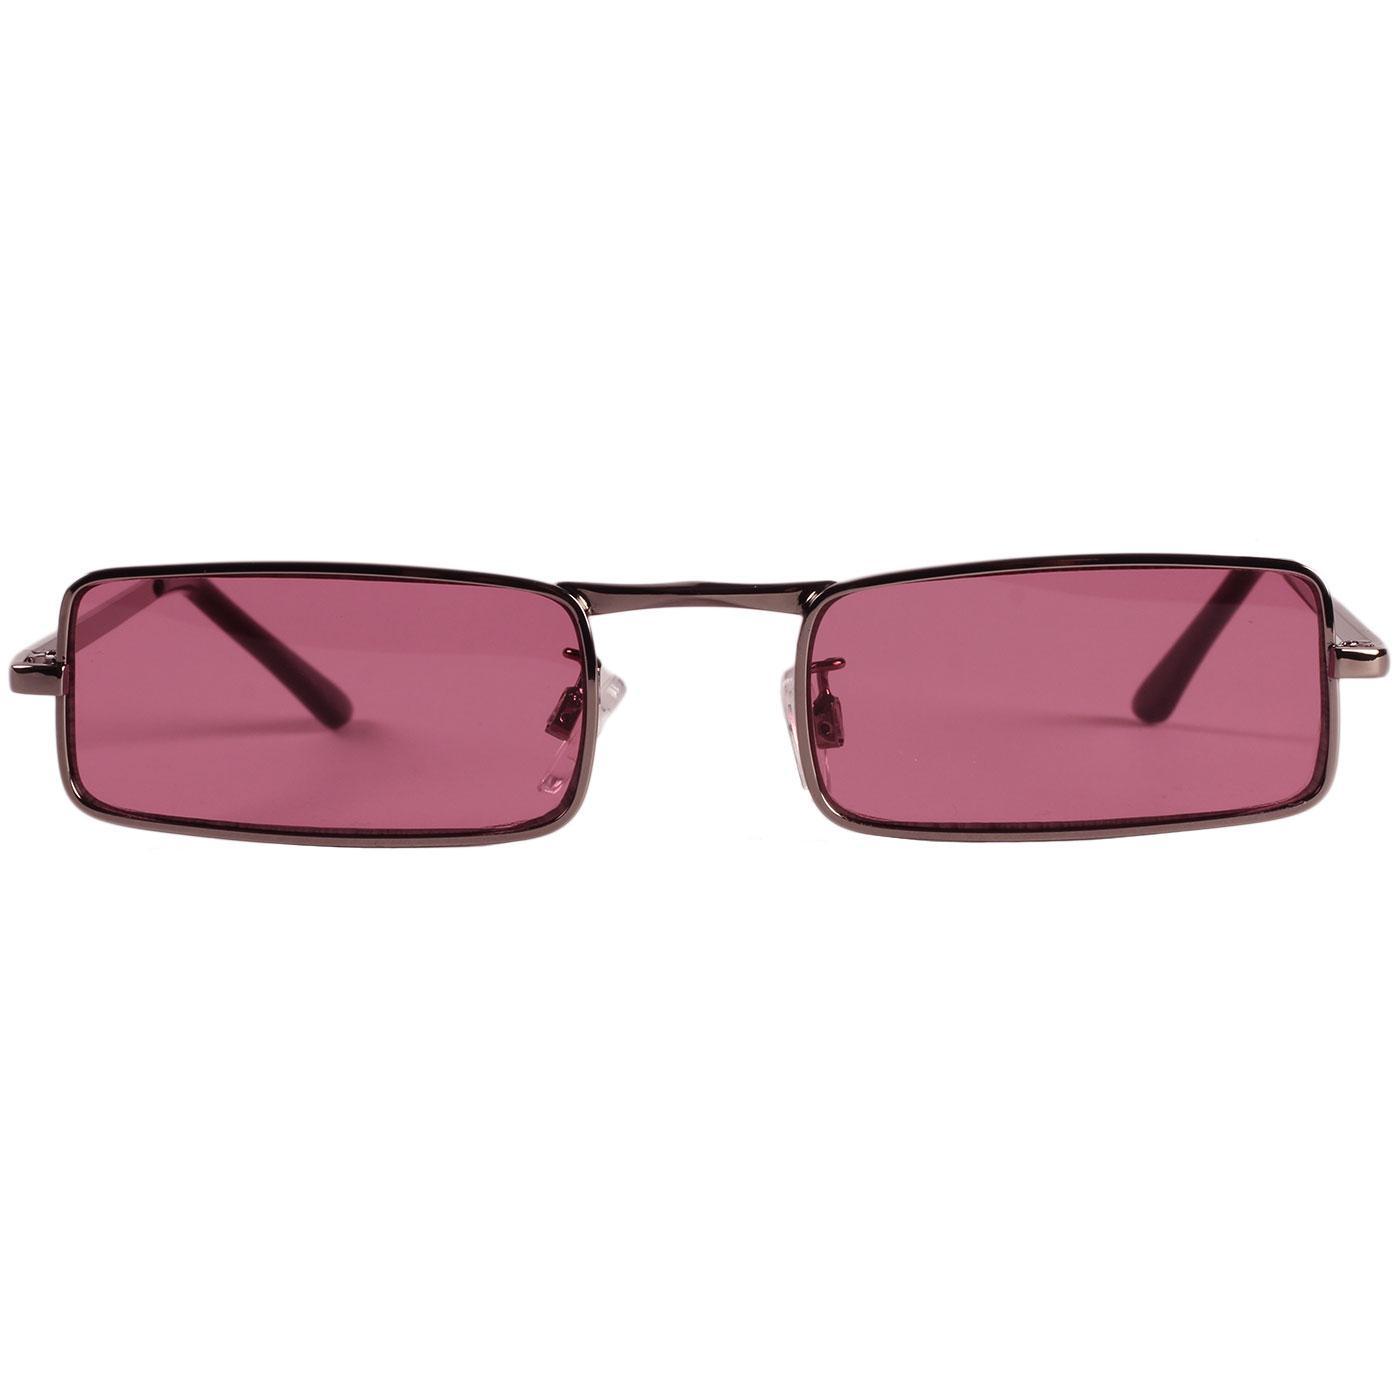 McGuinn MADCAP ENGLAND 1960s Granny Glasses PINK